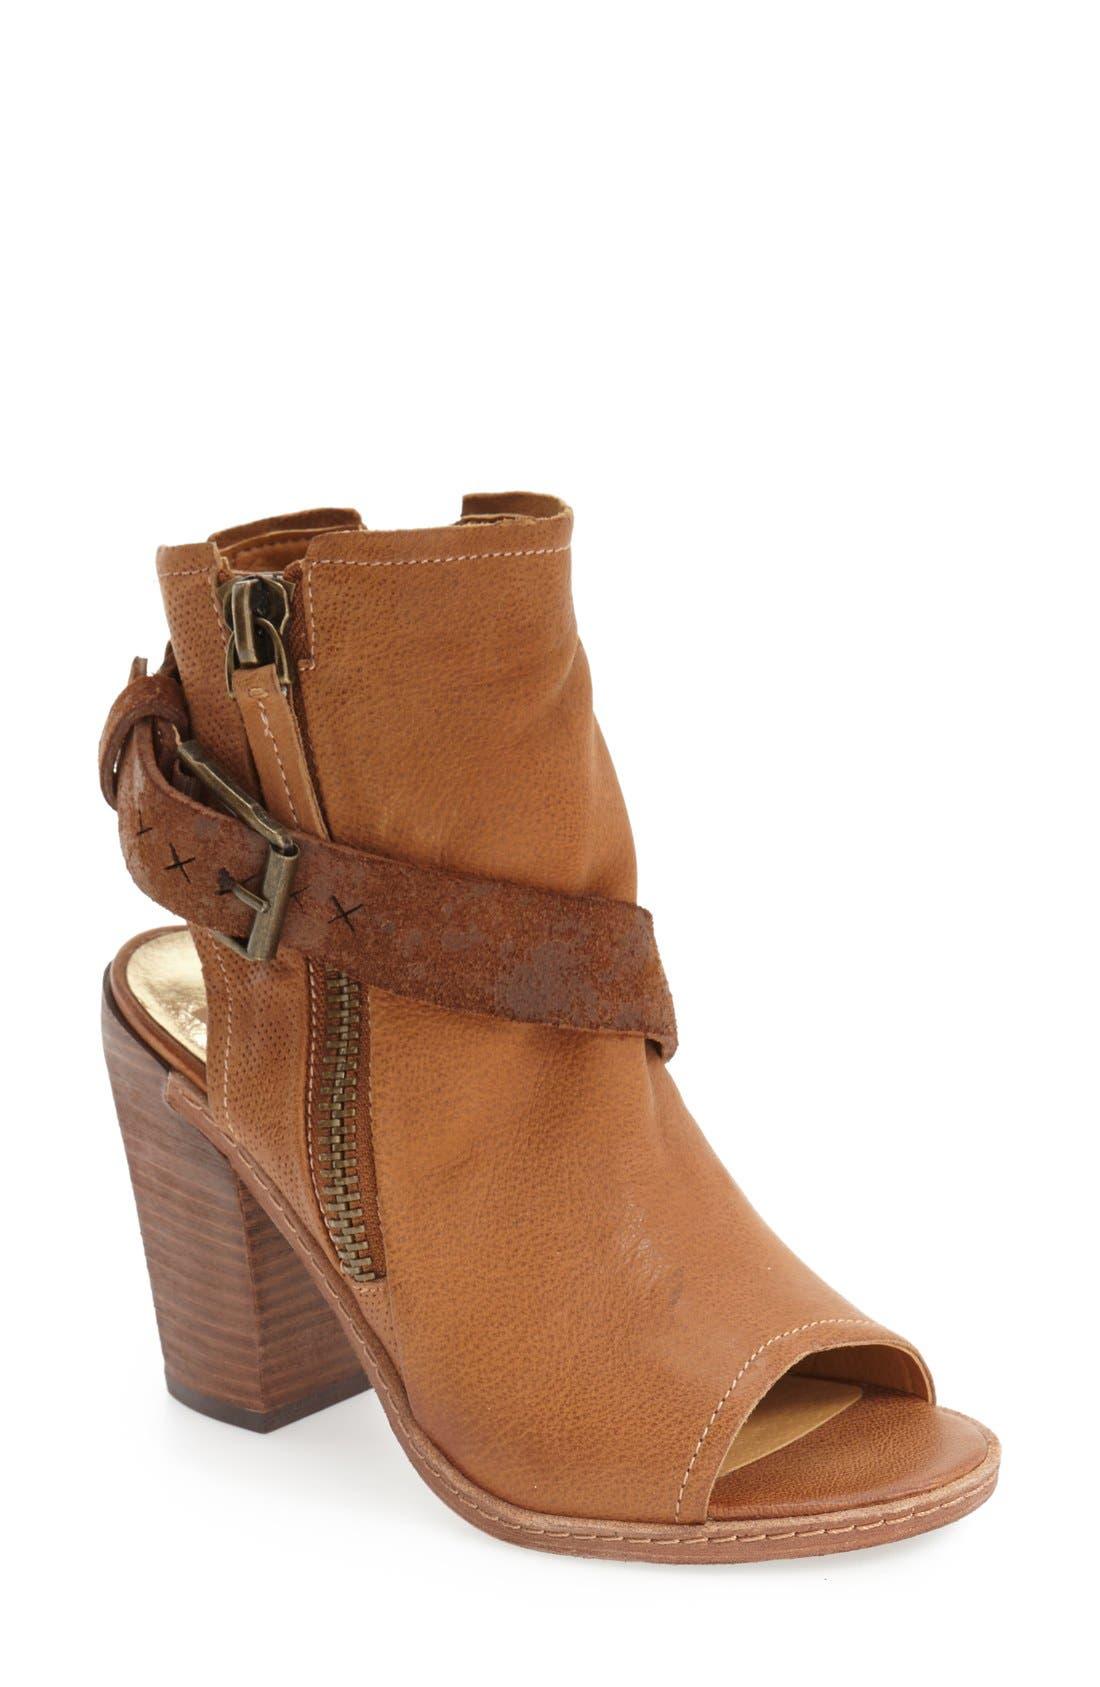 Alternate Image 1 Selected - Dolce Vita 'North' Buckle Sandal (Women)